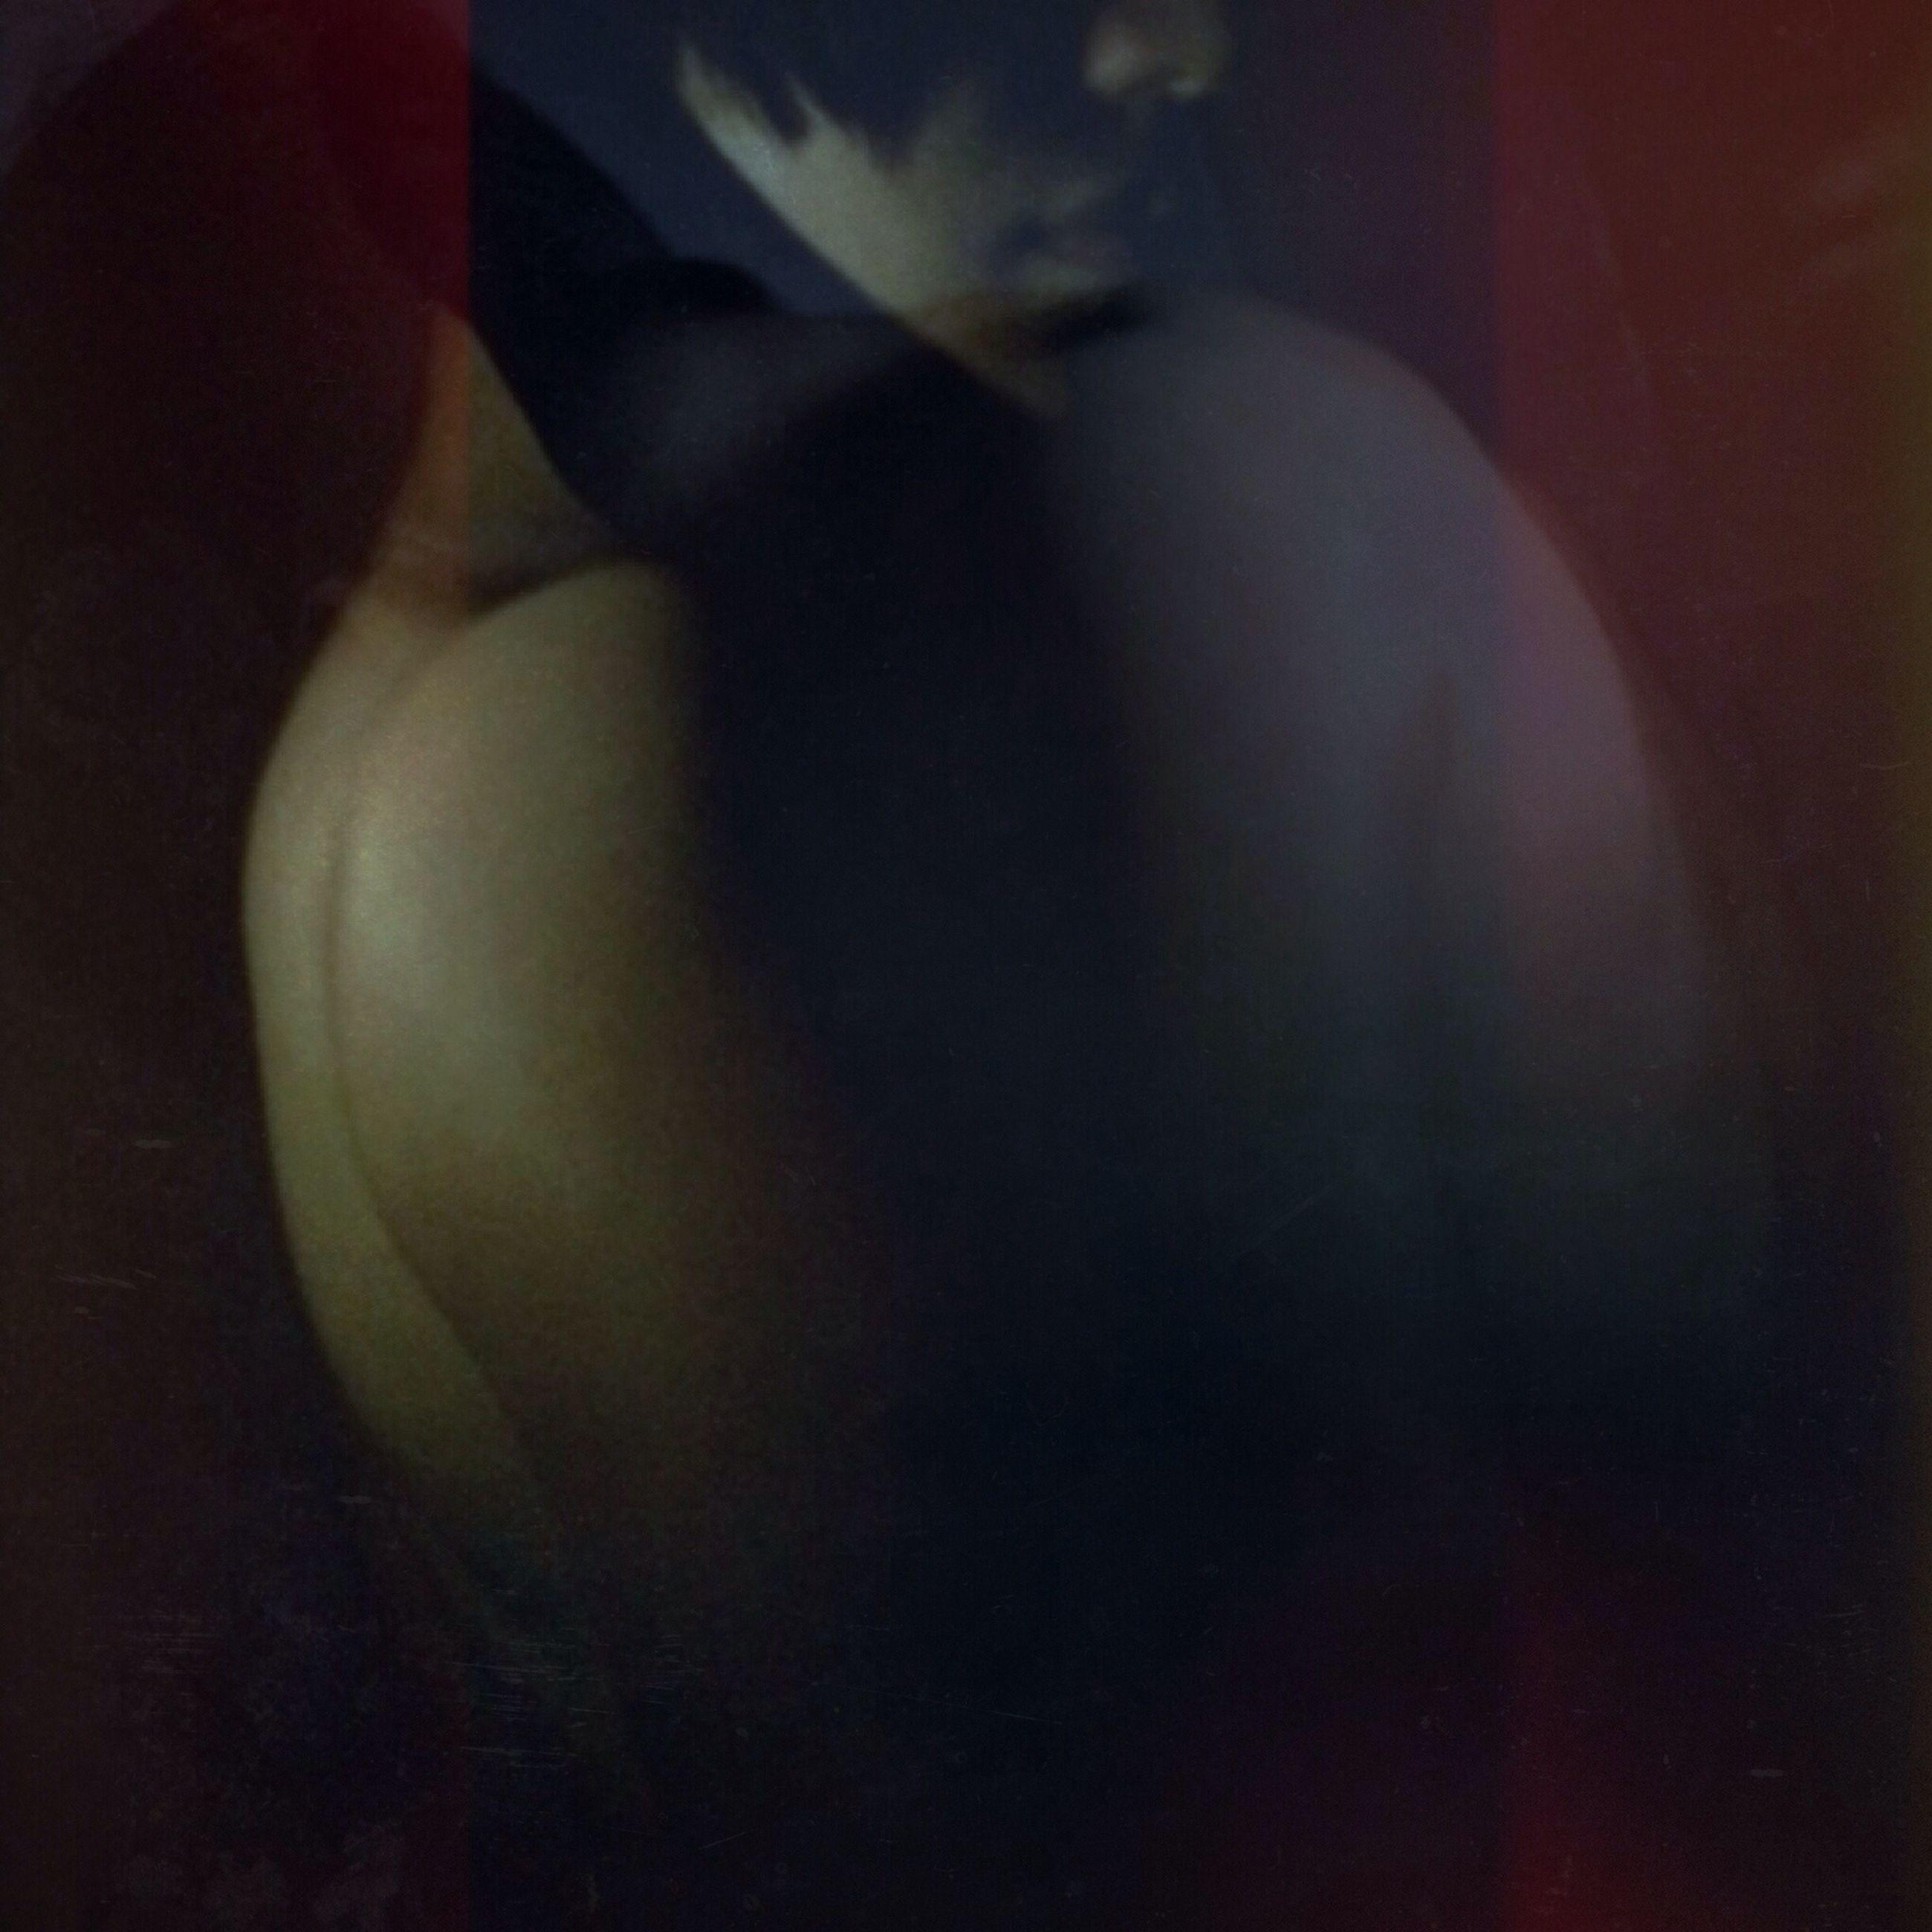 indoors, dark, night, close-up, person, lifestyles, selective focus, black background, home interior, light - natural phenomenon, unrecognizable person, nature, part of, studio shot, copy space, men